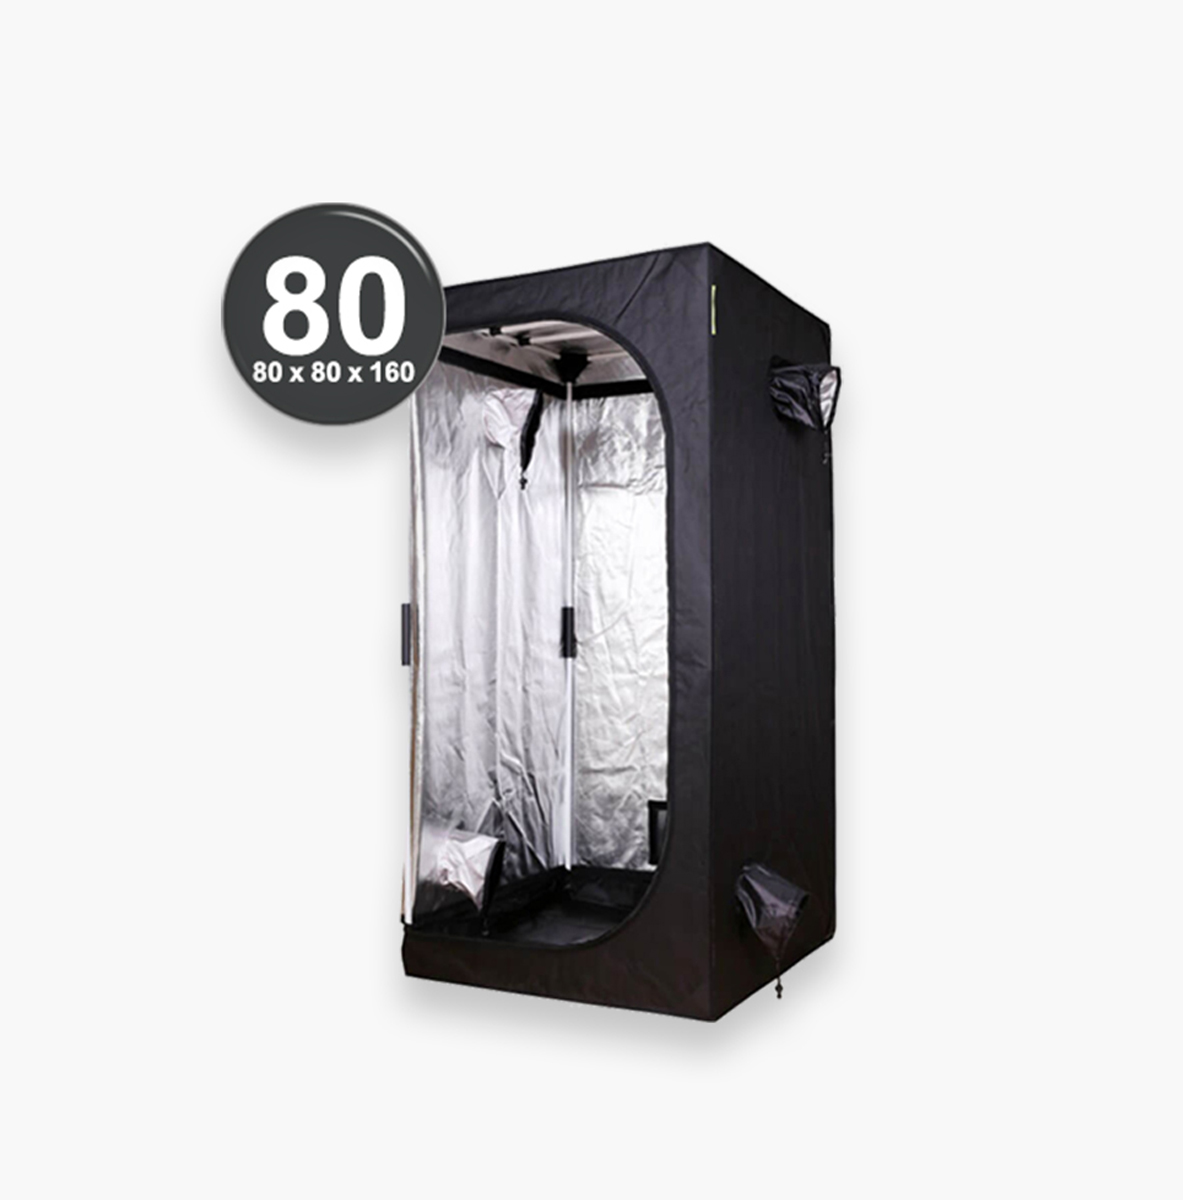 Estufa Pro Box Basic Pro 80 - 80x80x160 cm